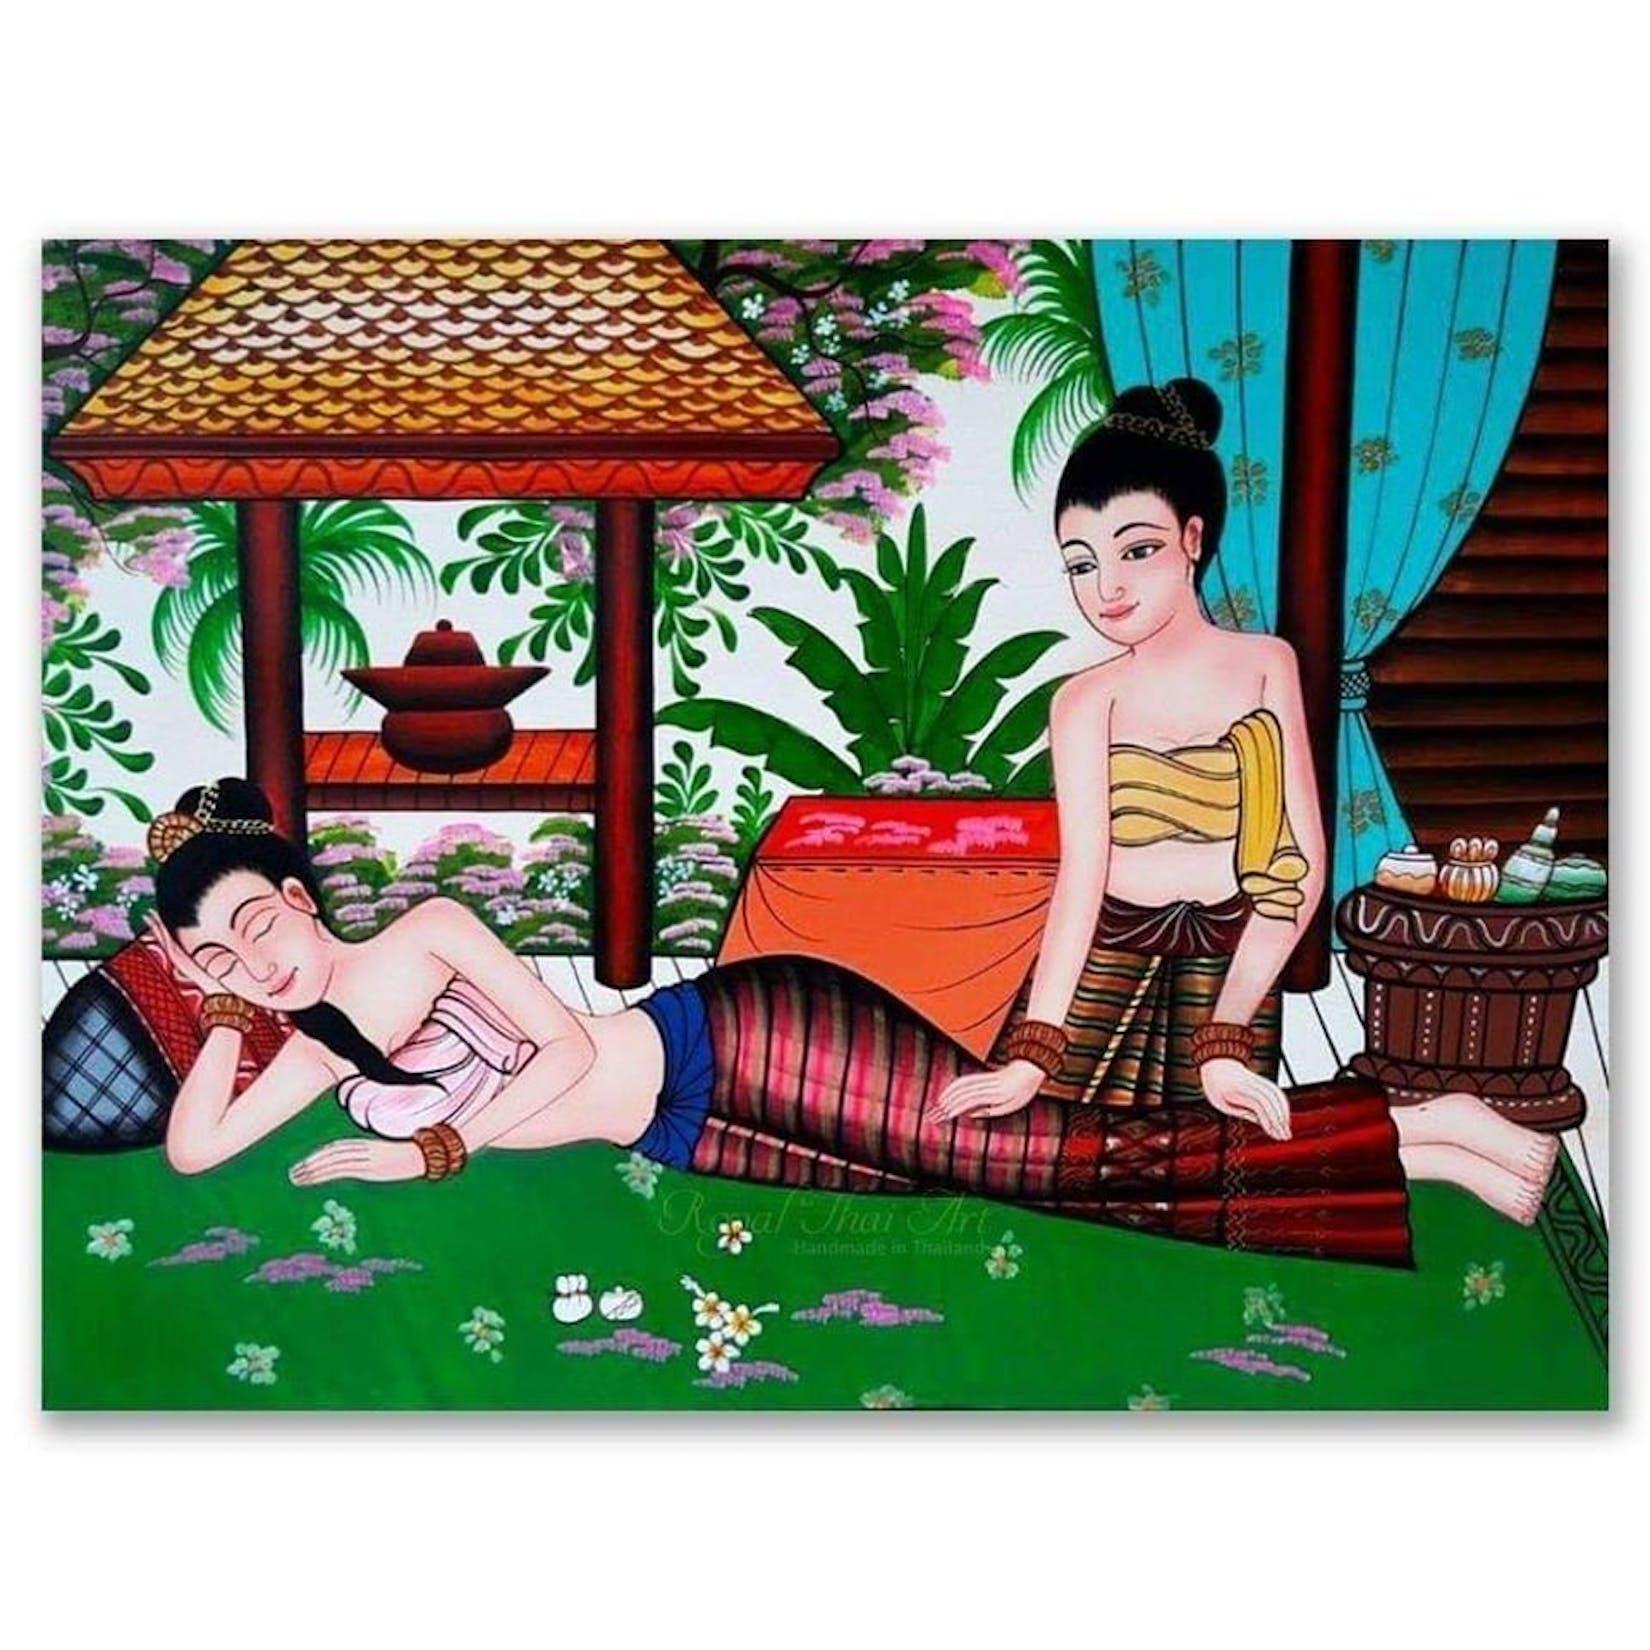 Beauty Orchid Wellness Spa & Reflexology | Beauty